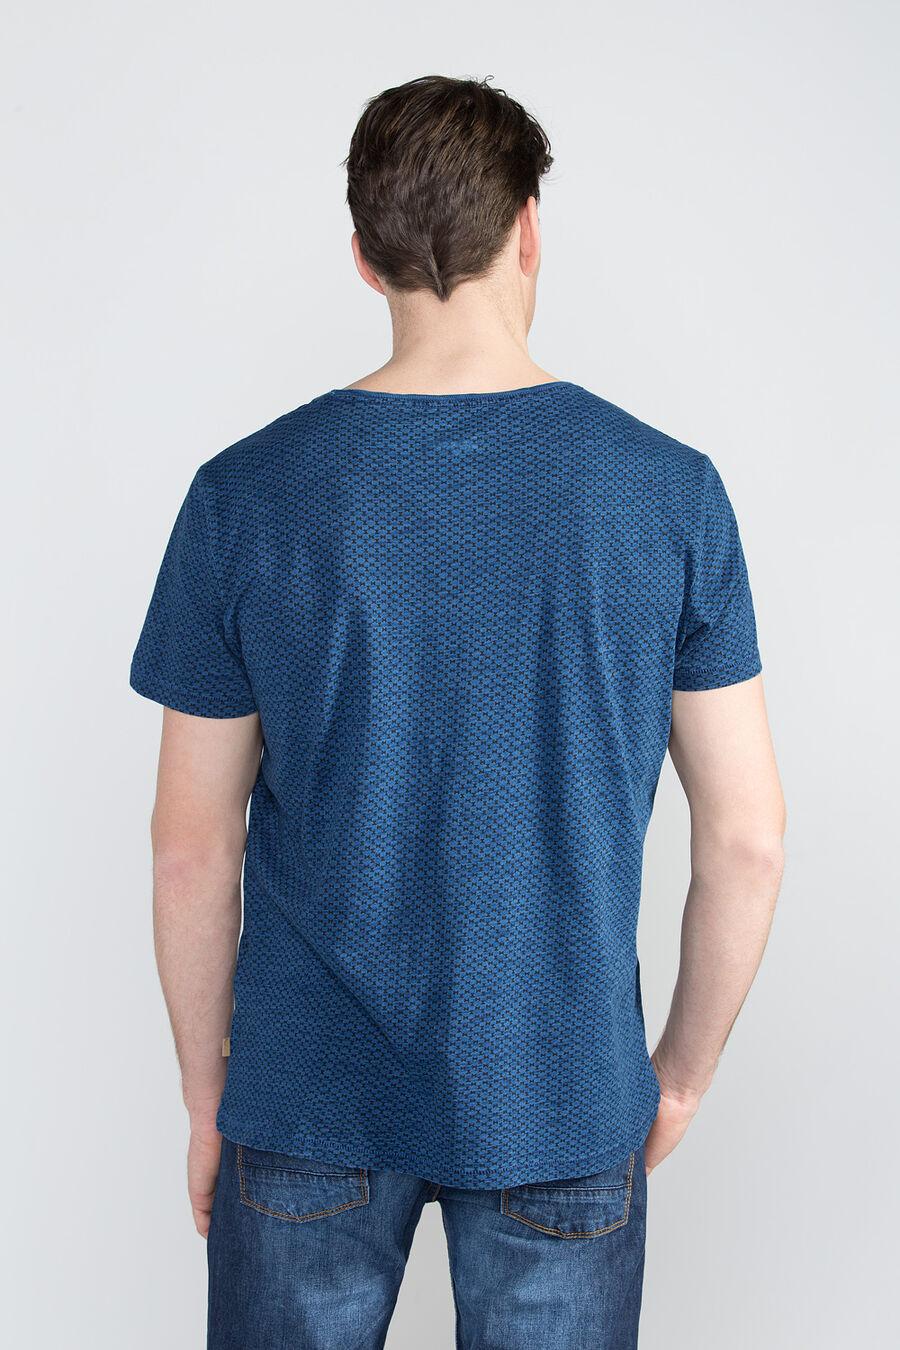 Camiseta índigo